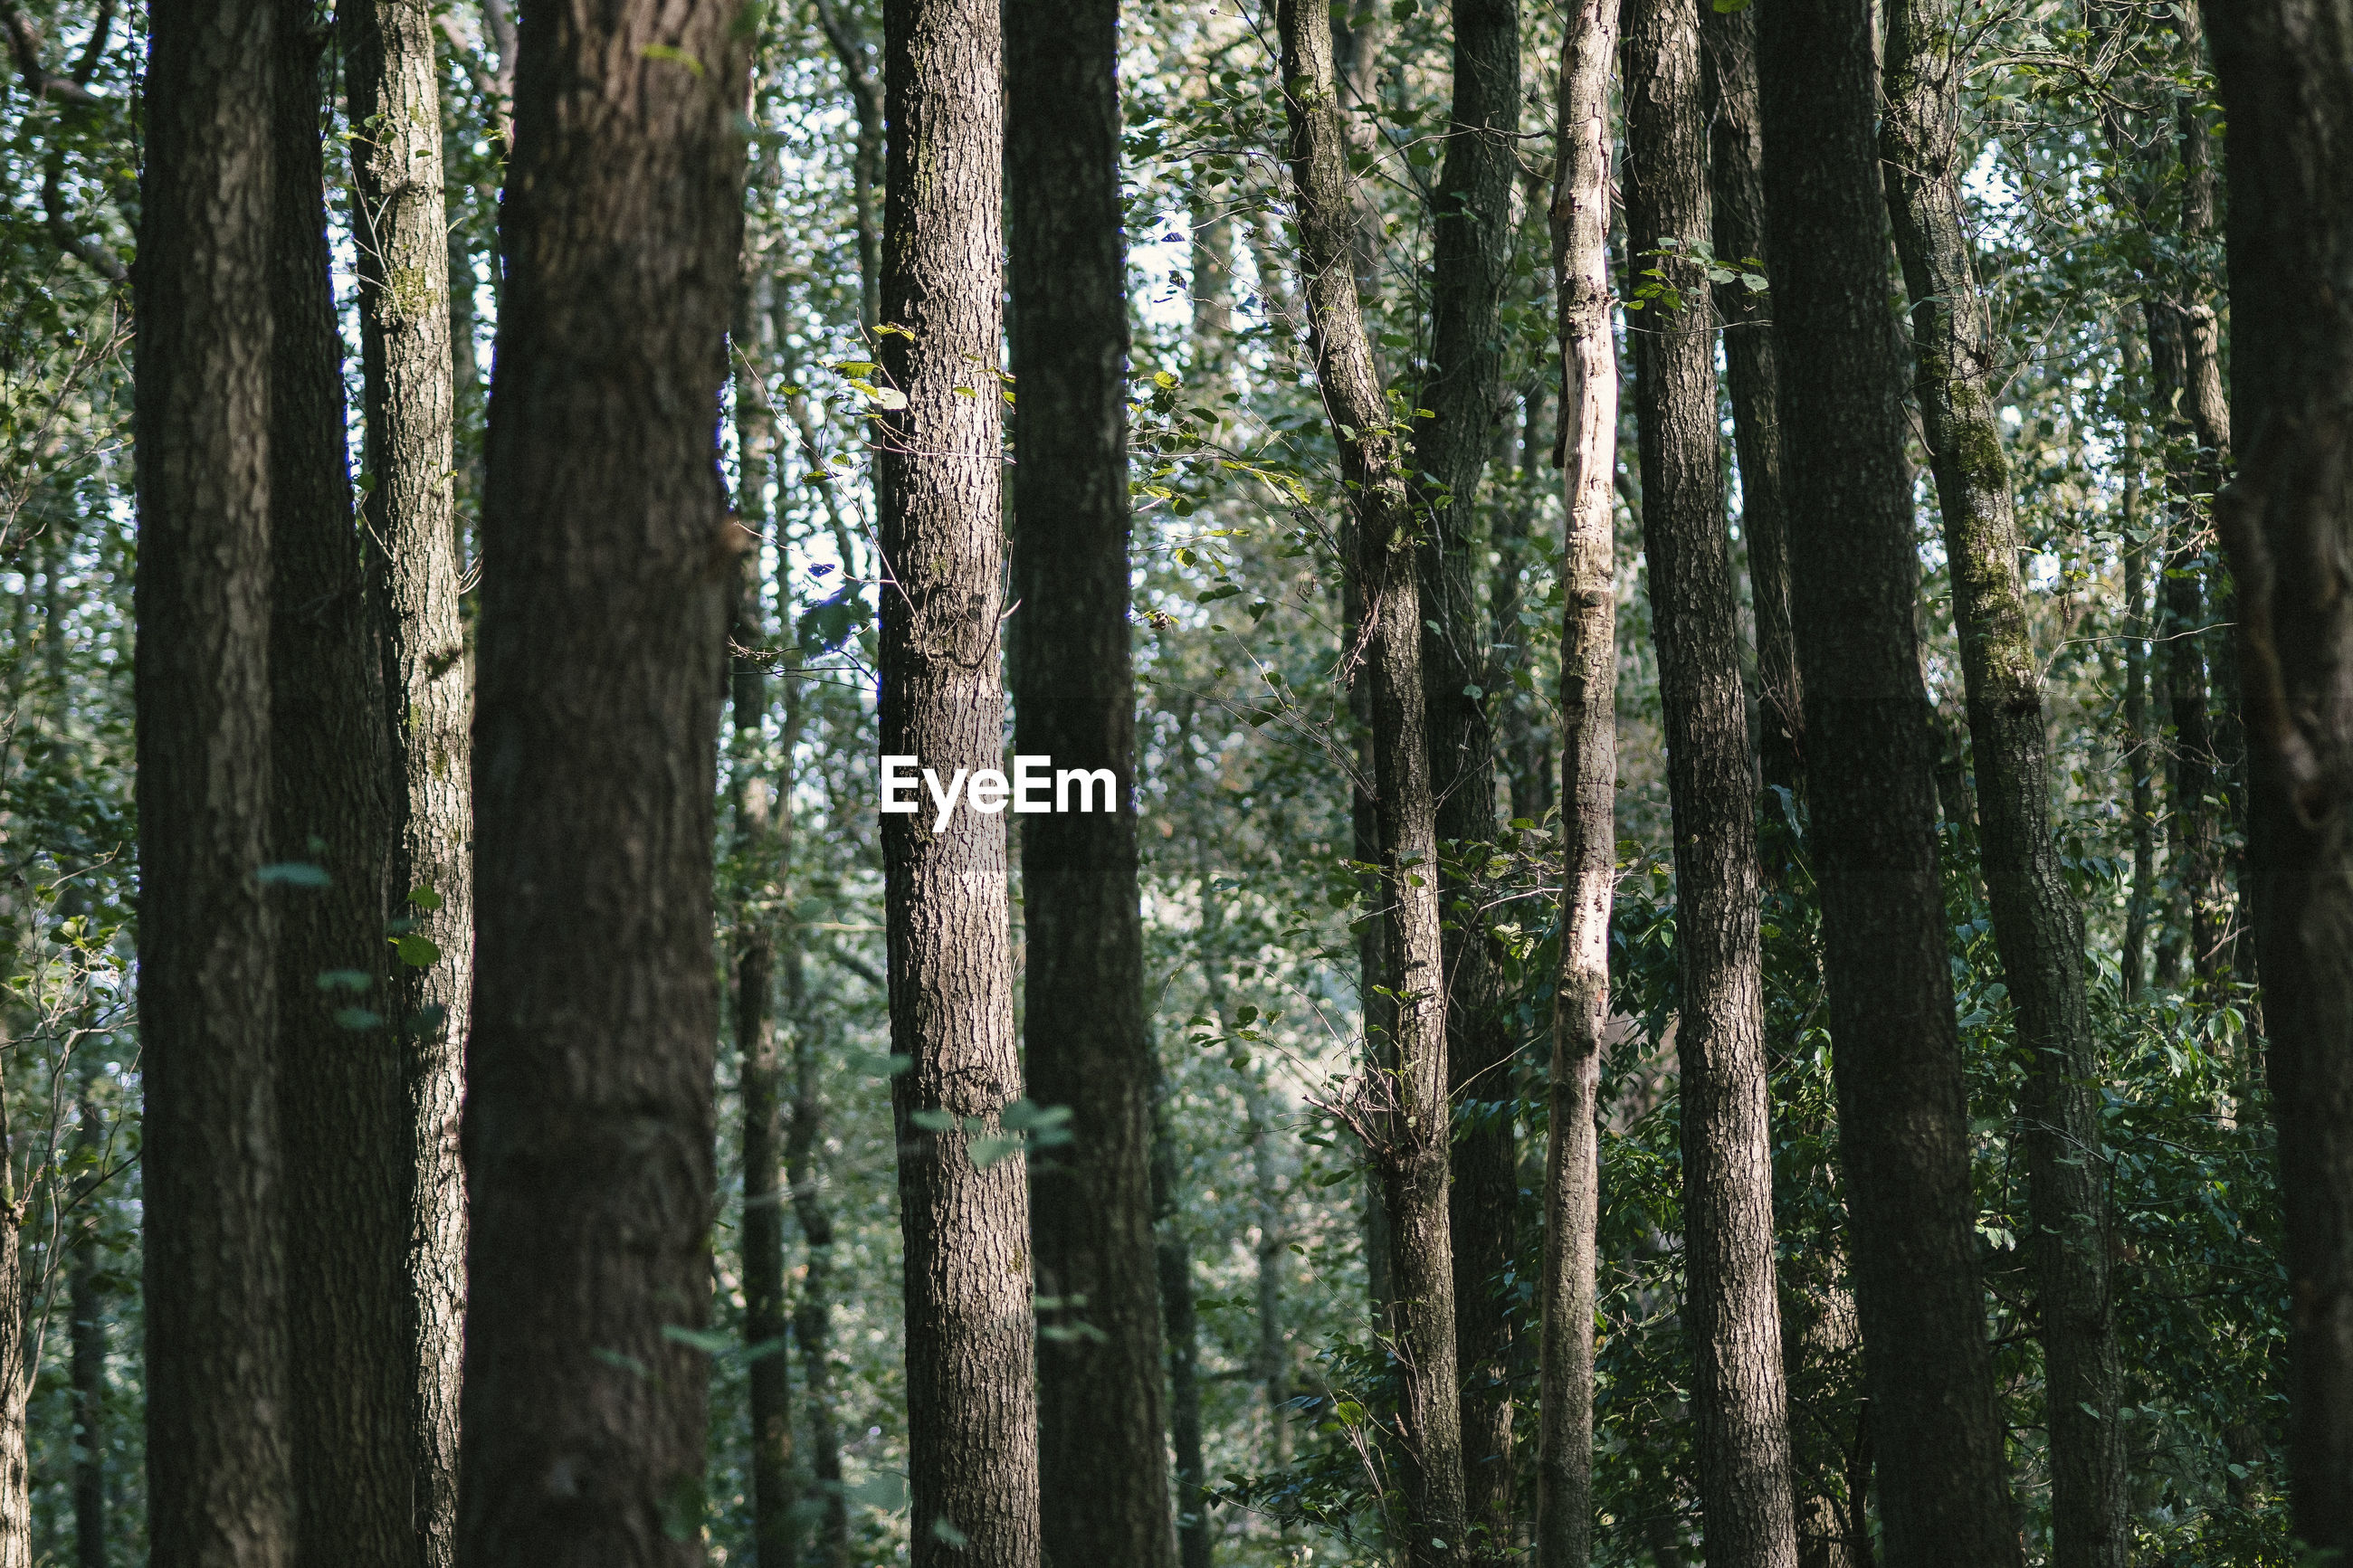 FULL FRAME SHOT OF TREES IN THE FOREST